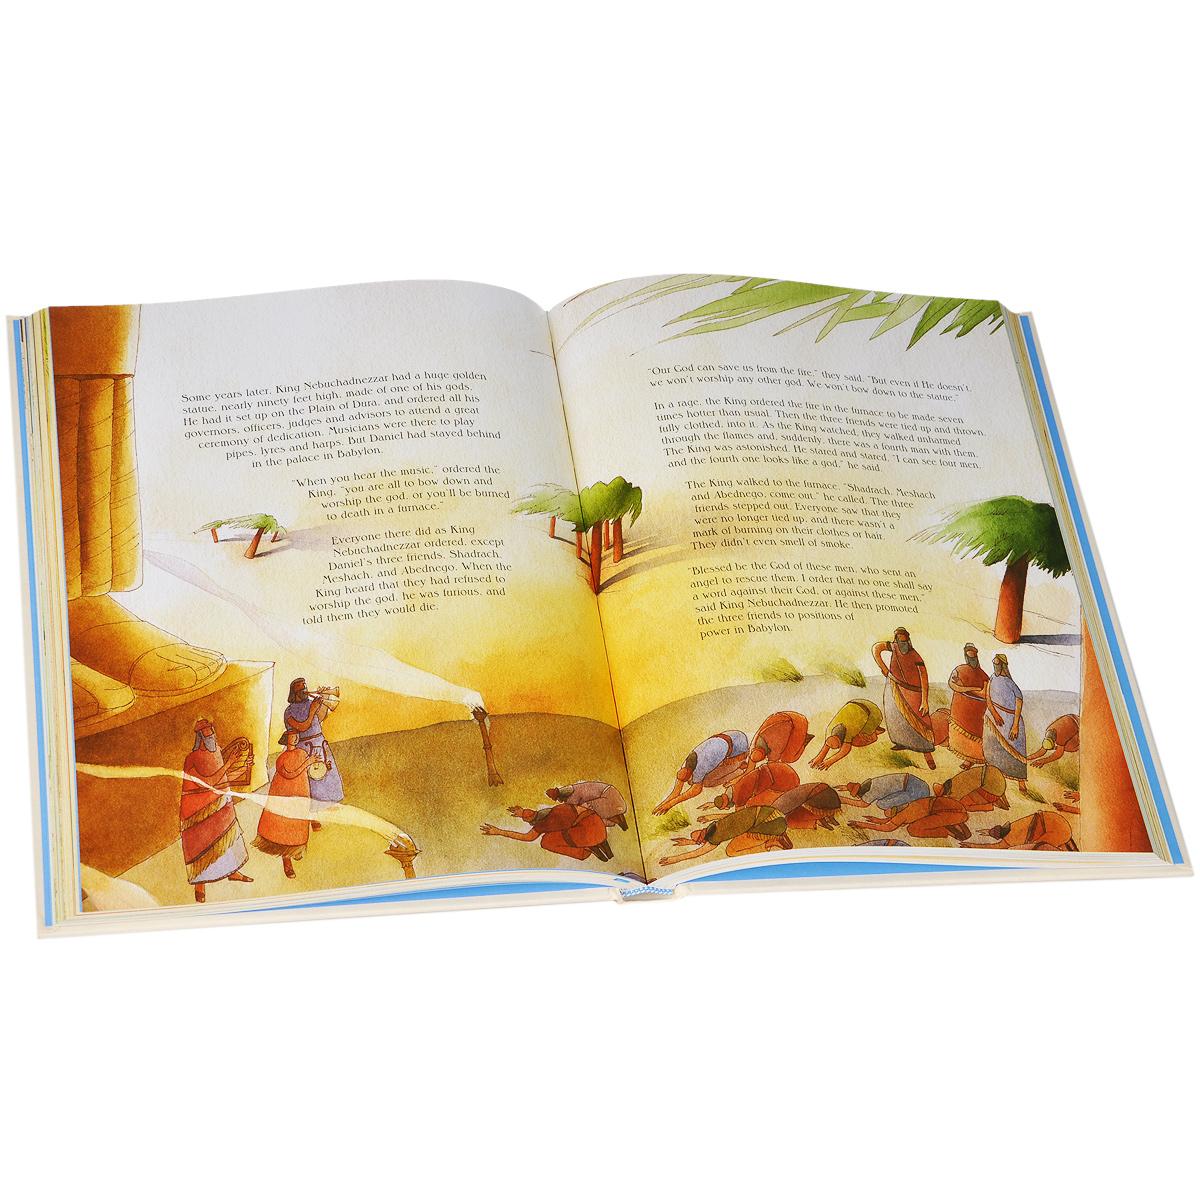 Heather Amery. The Usborne Illustrated Children's Bible